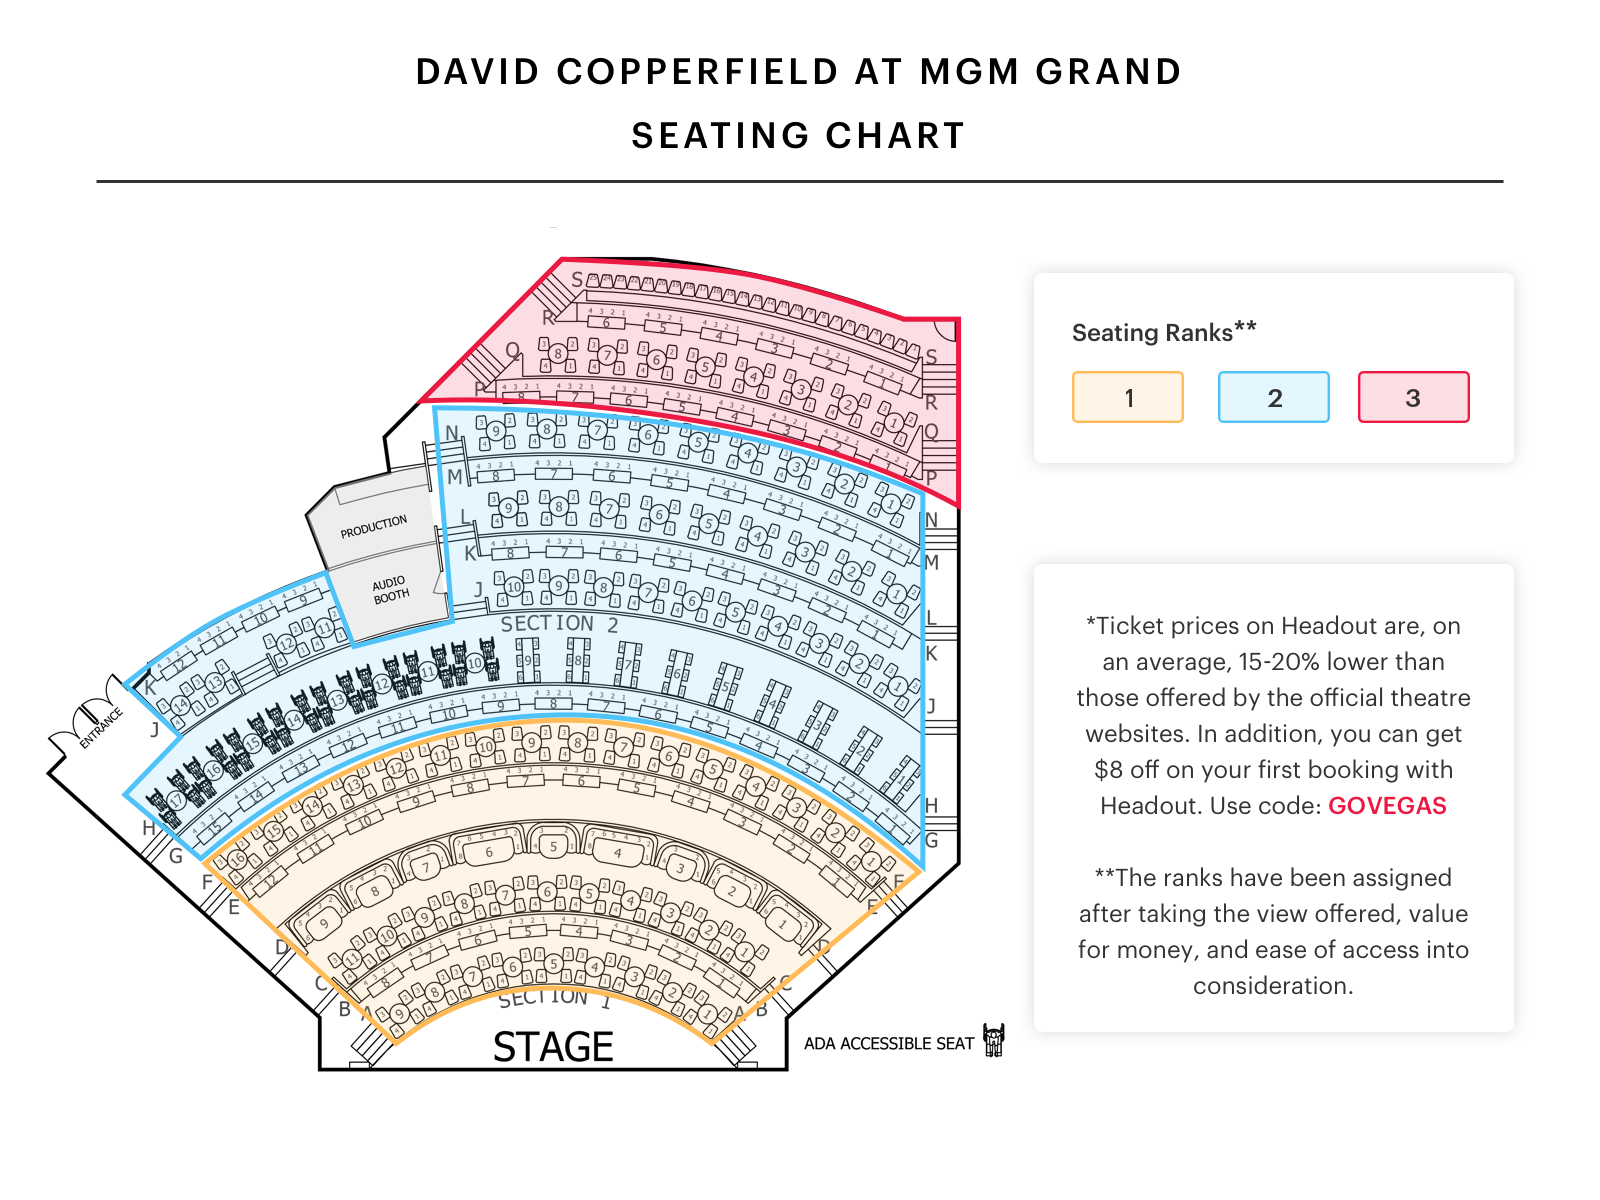 David Copperfield Las Vegas Show Seating Chart In 2020 Seating Charts Las Vegas Shows Chart